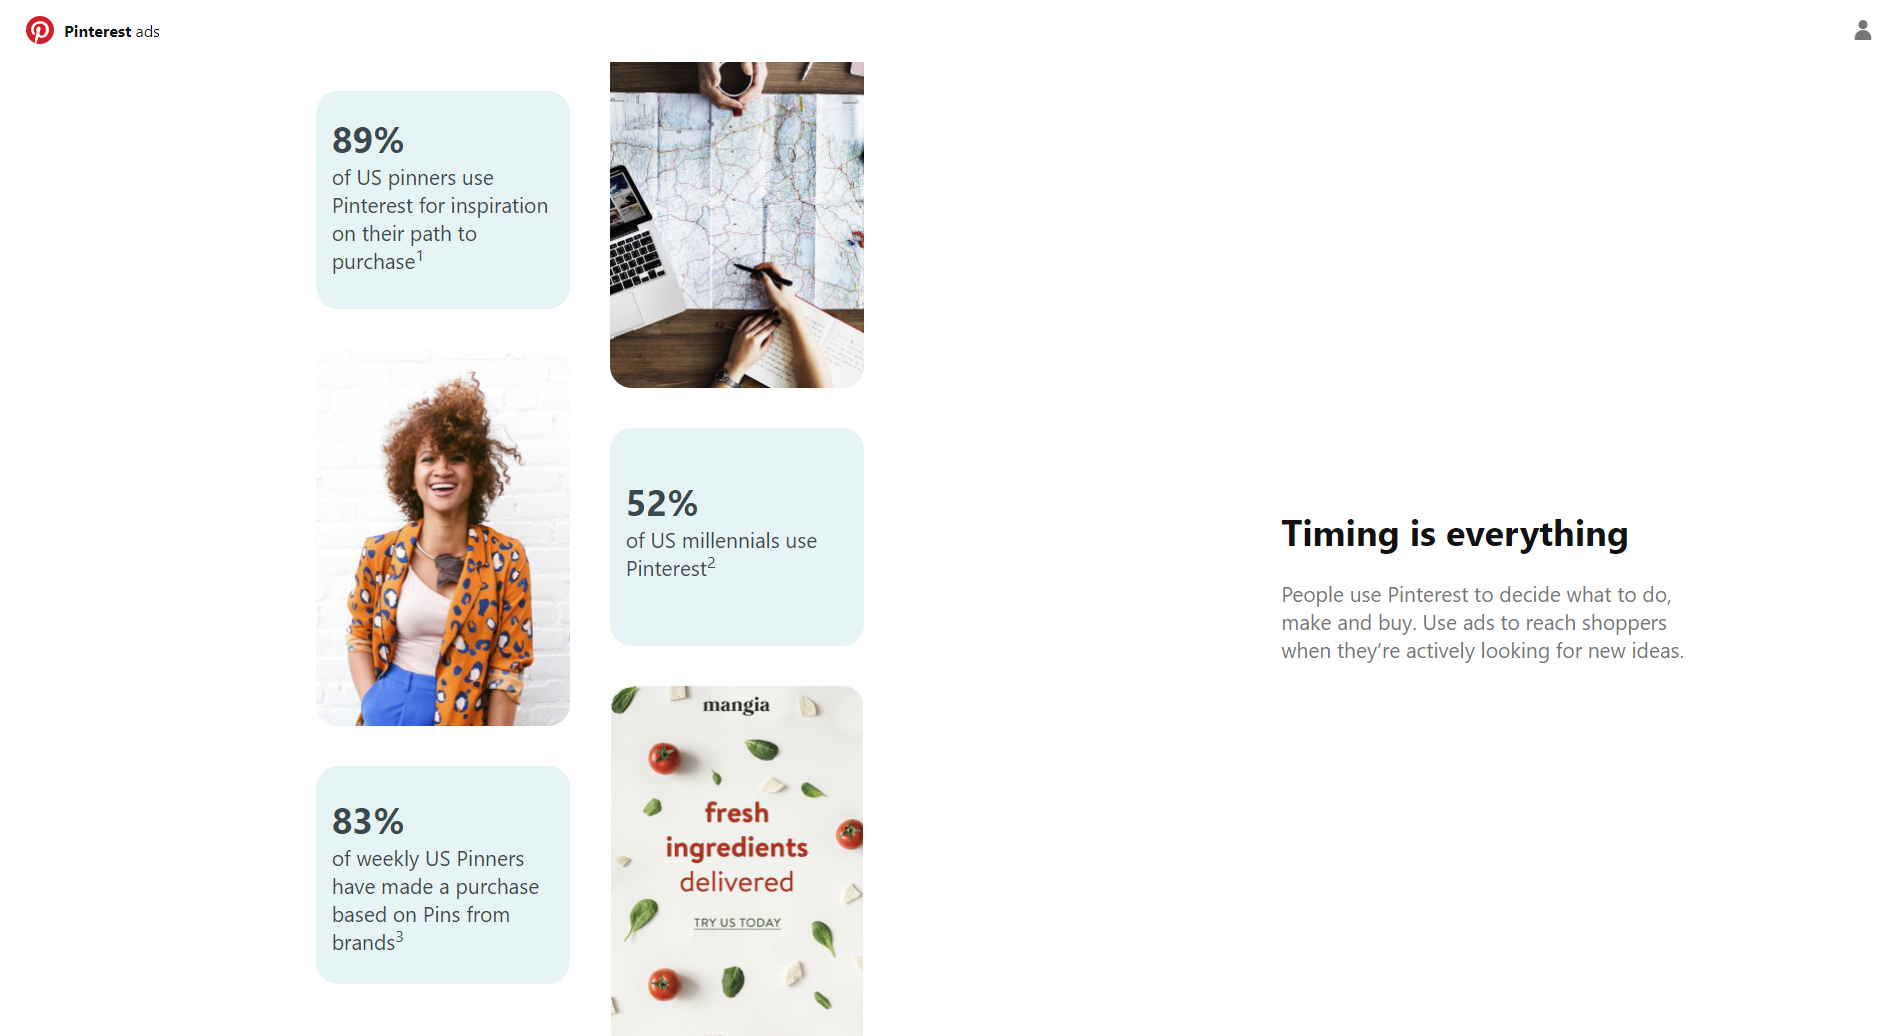 Pinterest ad statistics